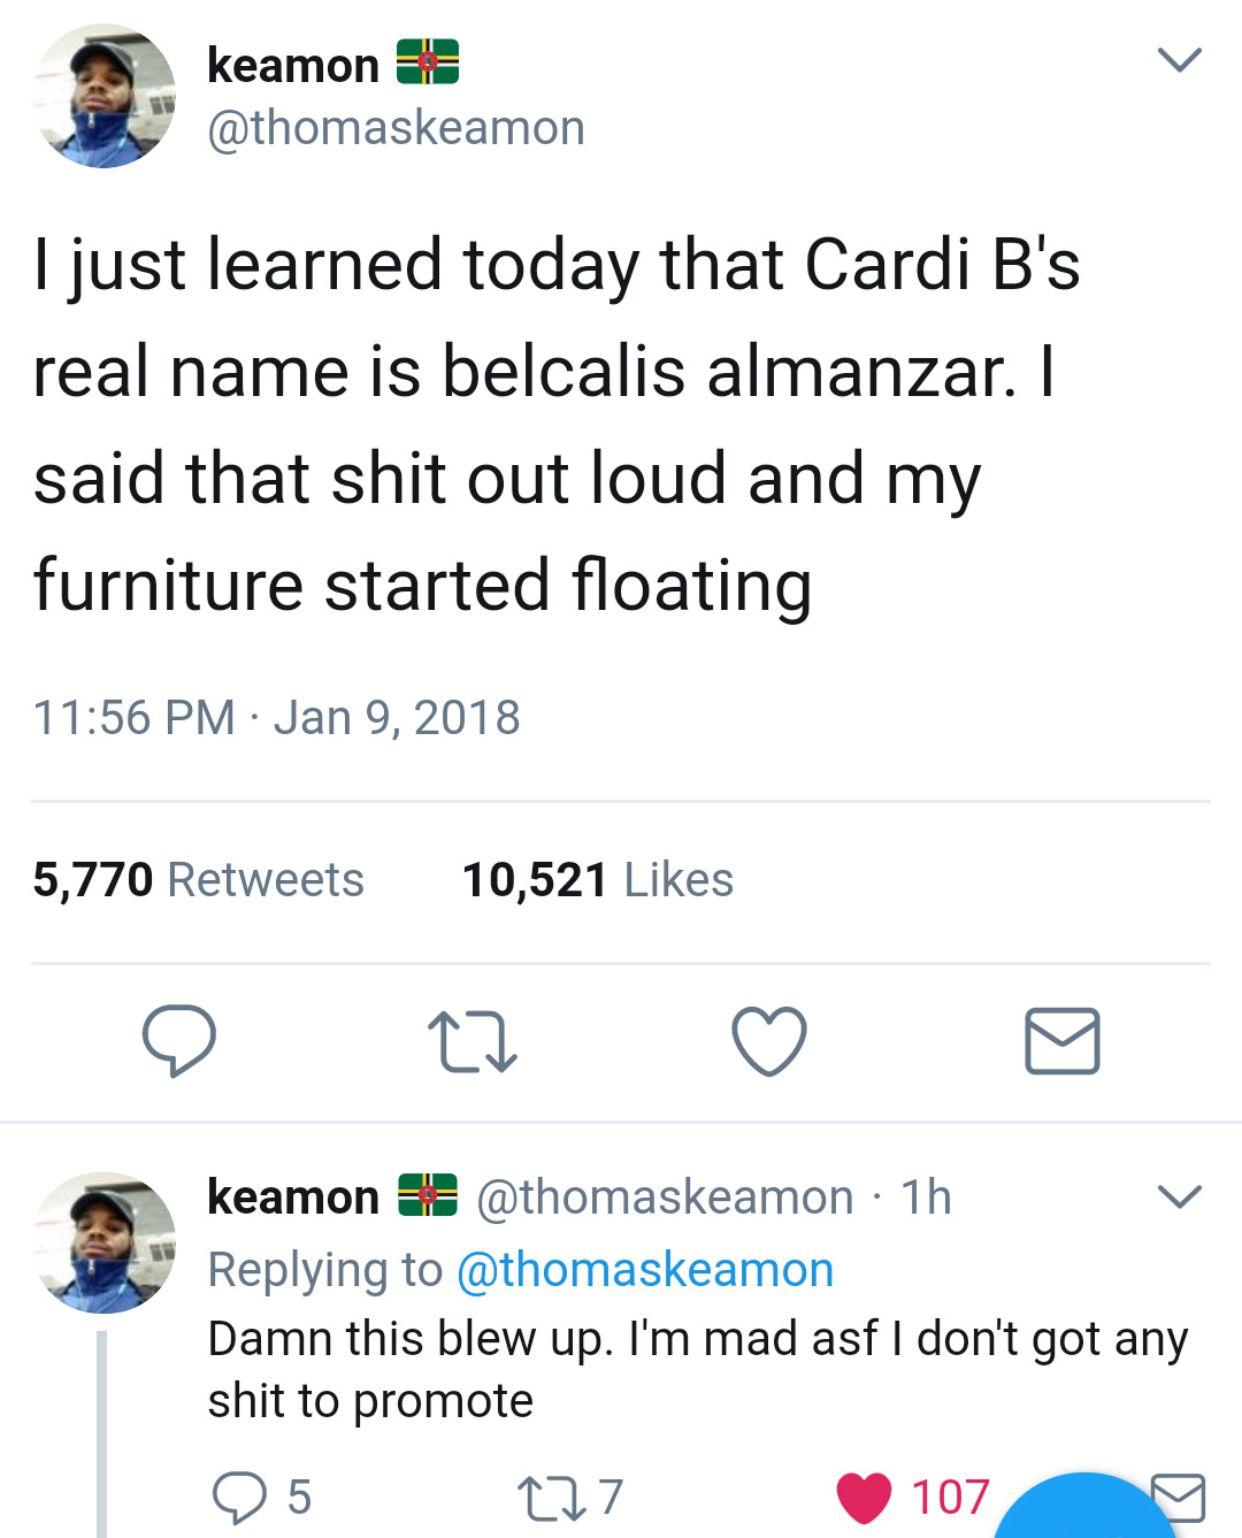 Pin By Autumn Locke On Dank Shit Twitter Funny Fandom Funny Funny Riddles